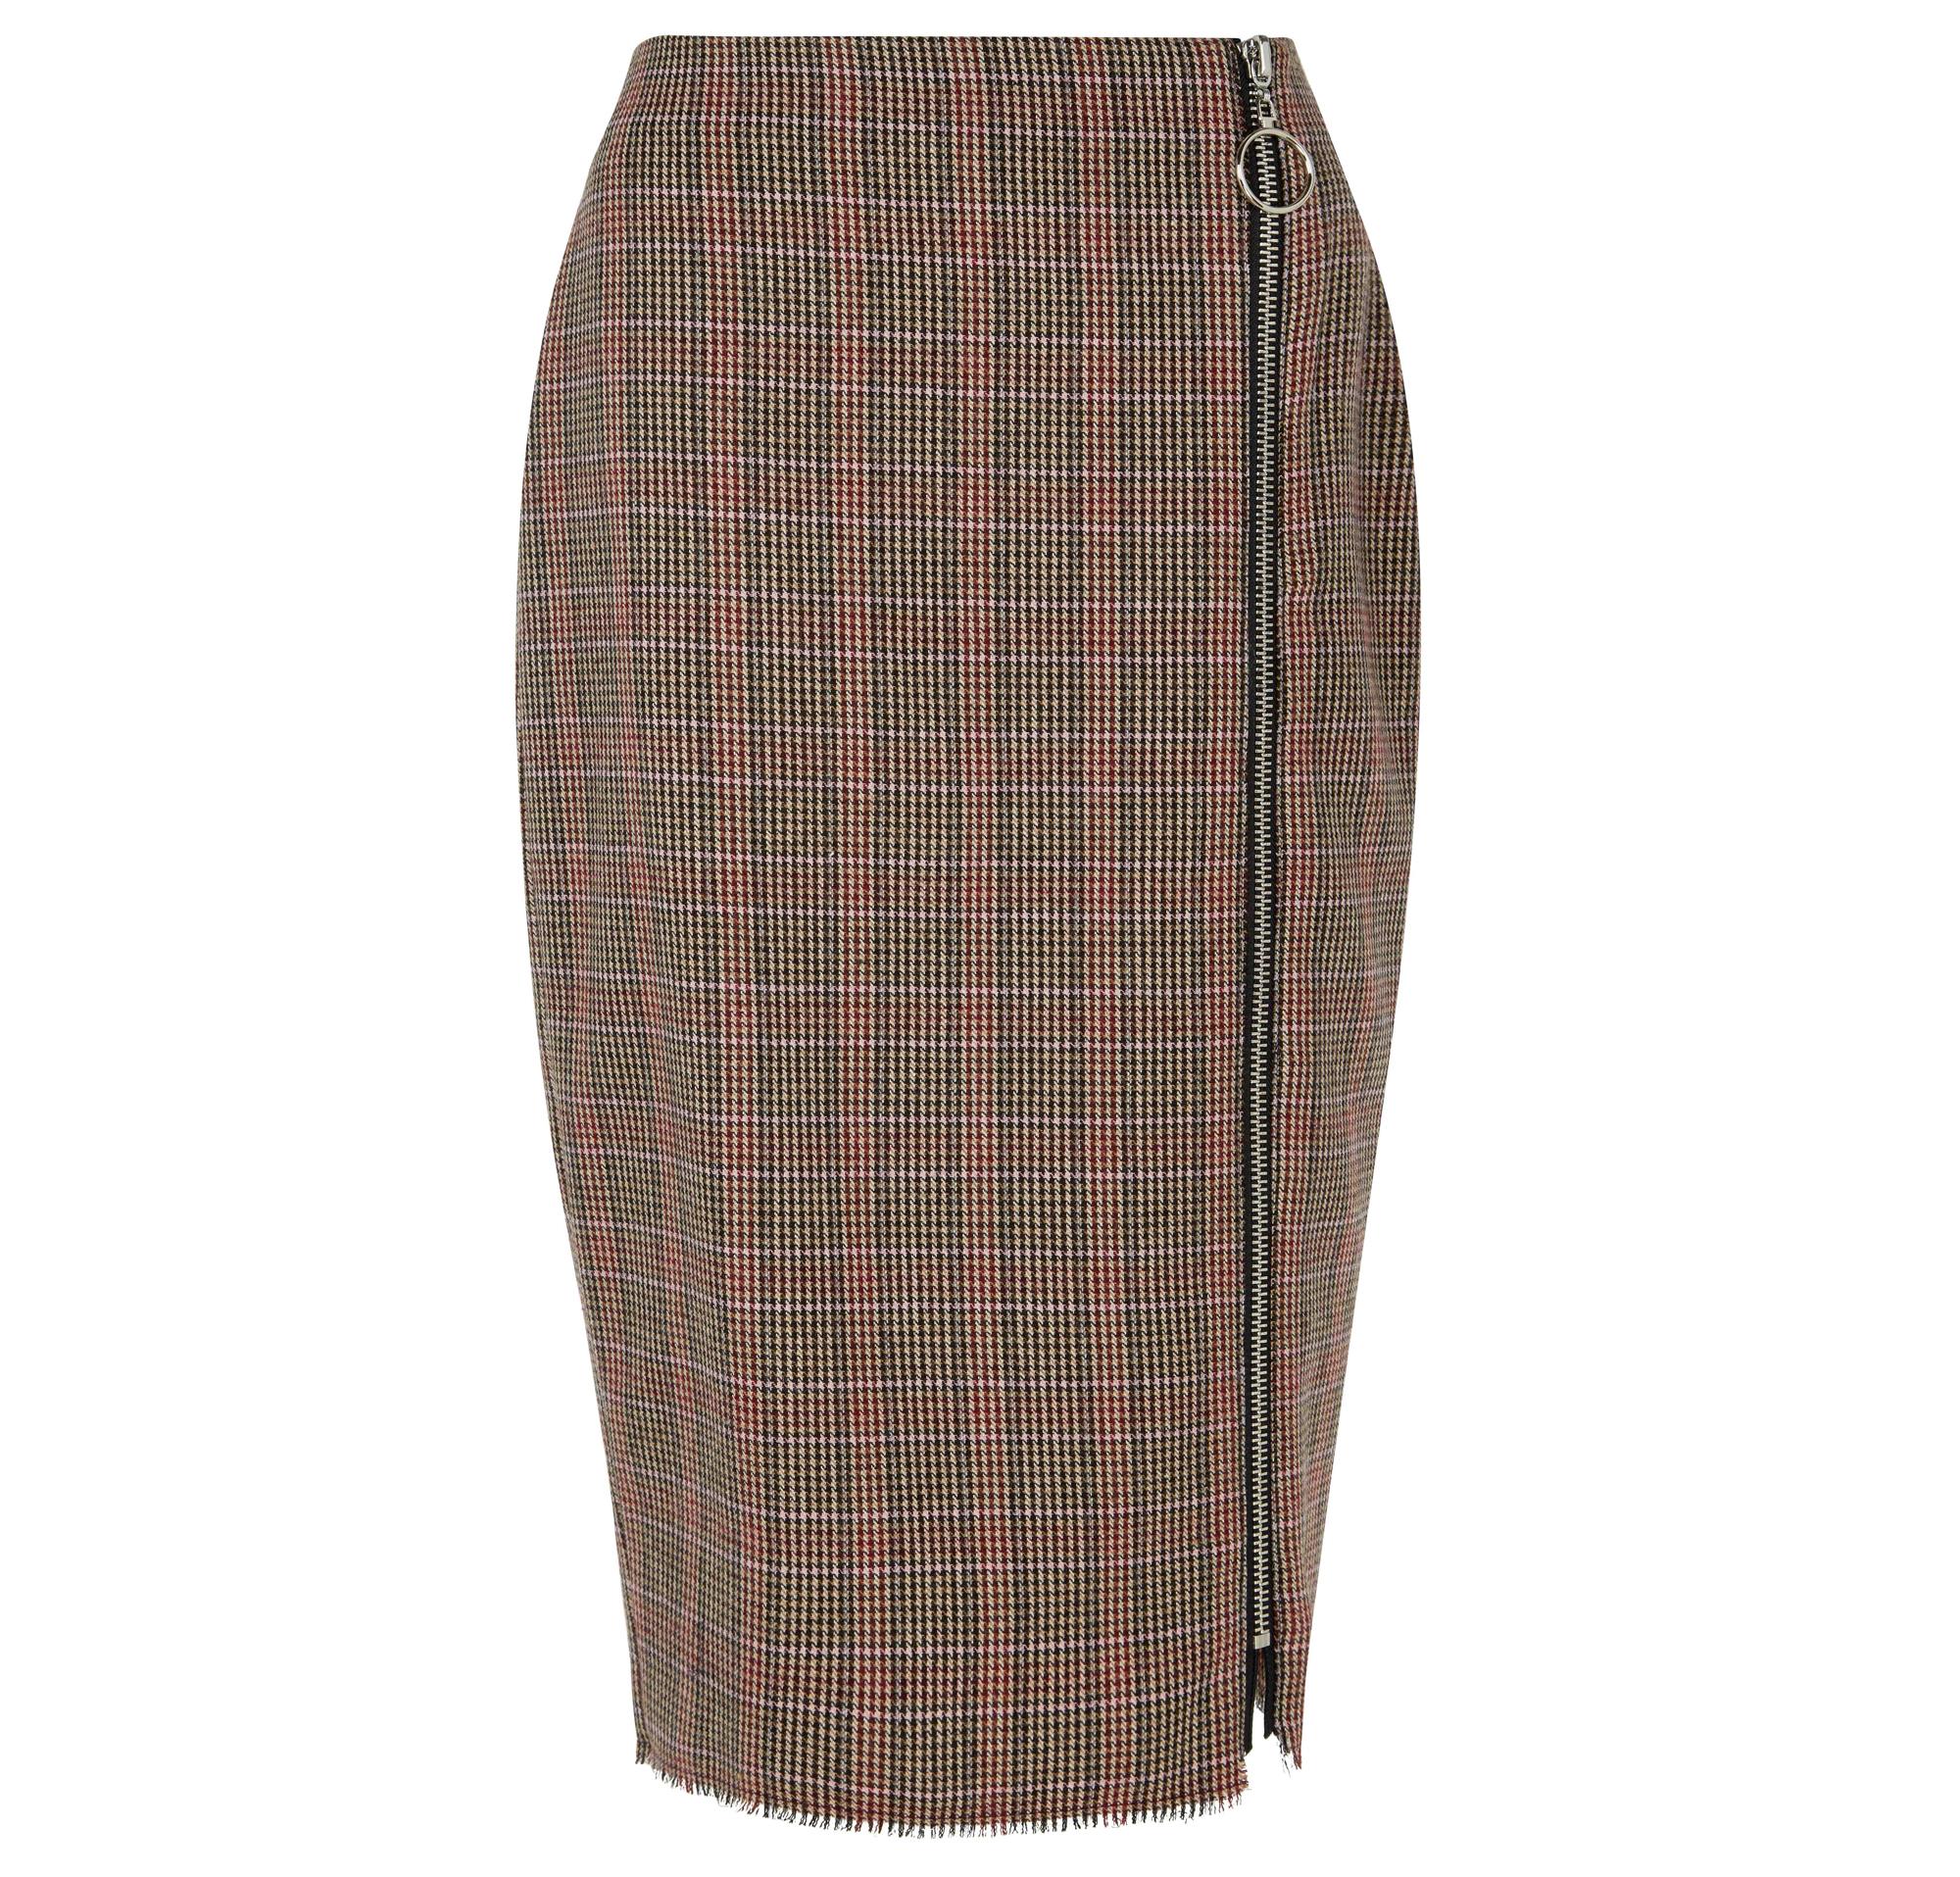 River Island Skirt (River Island/PA)